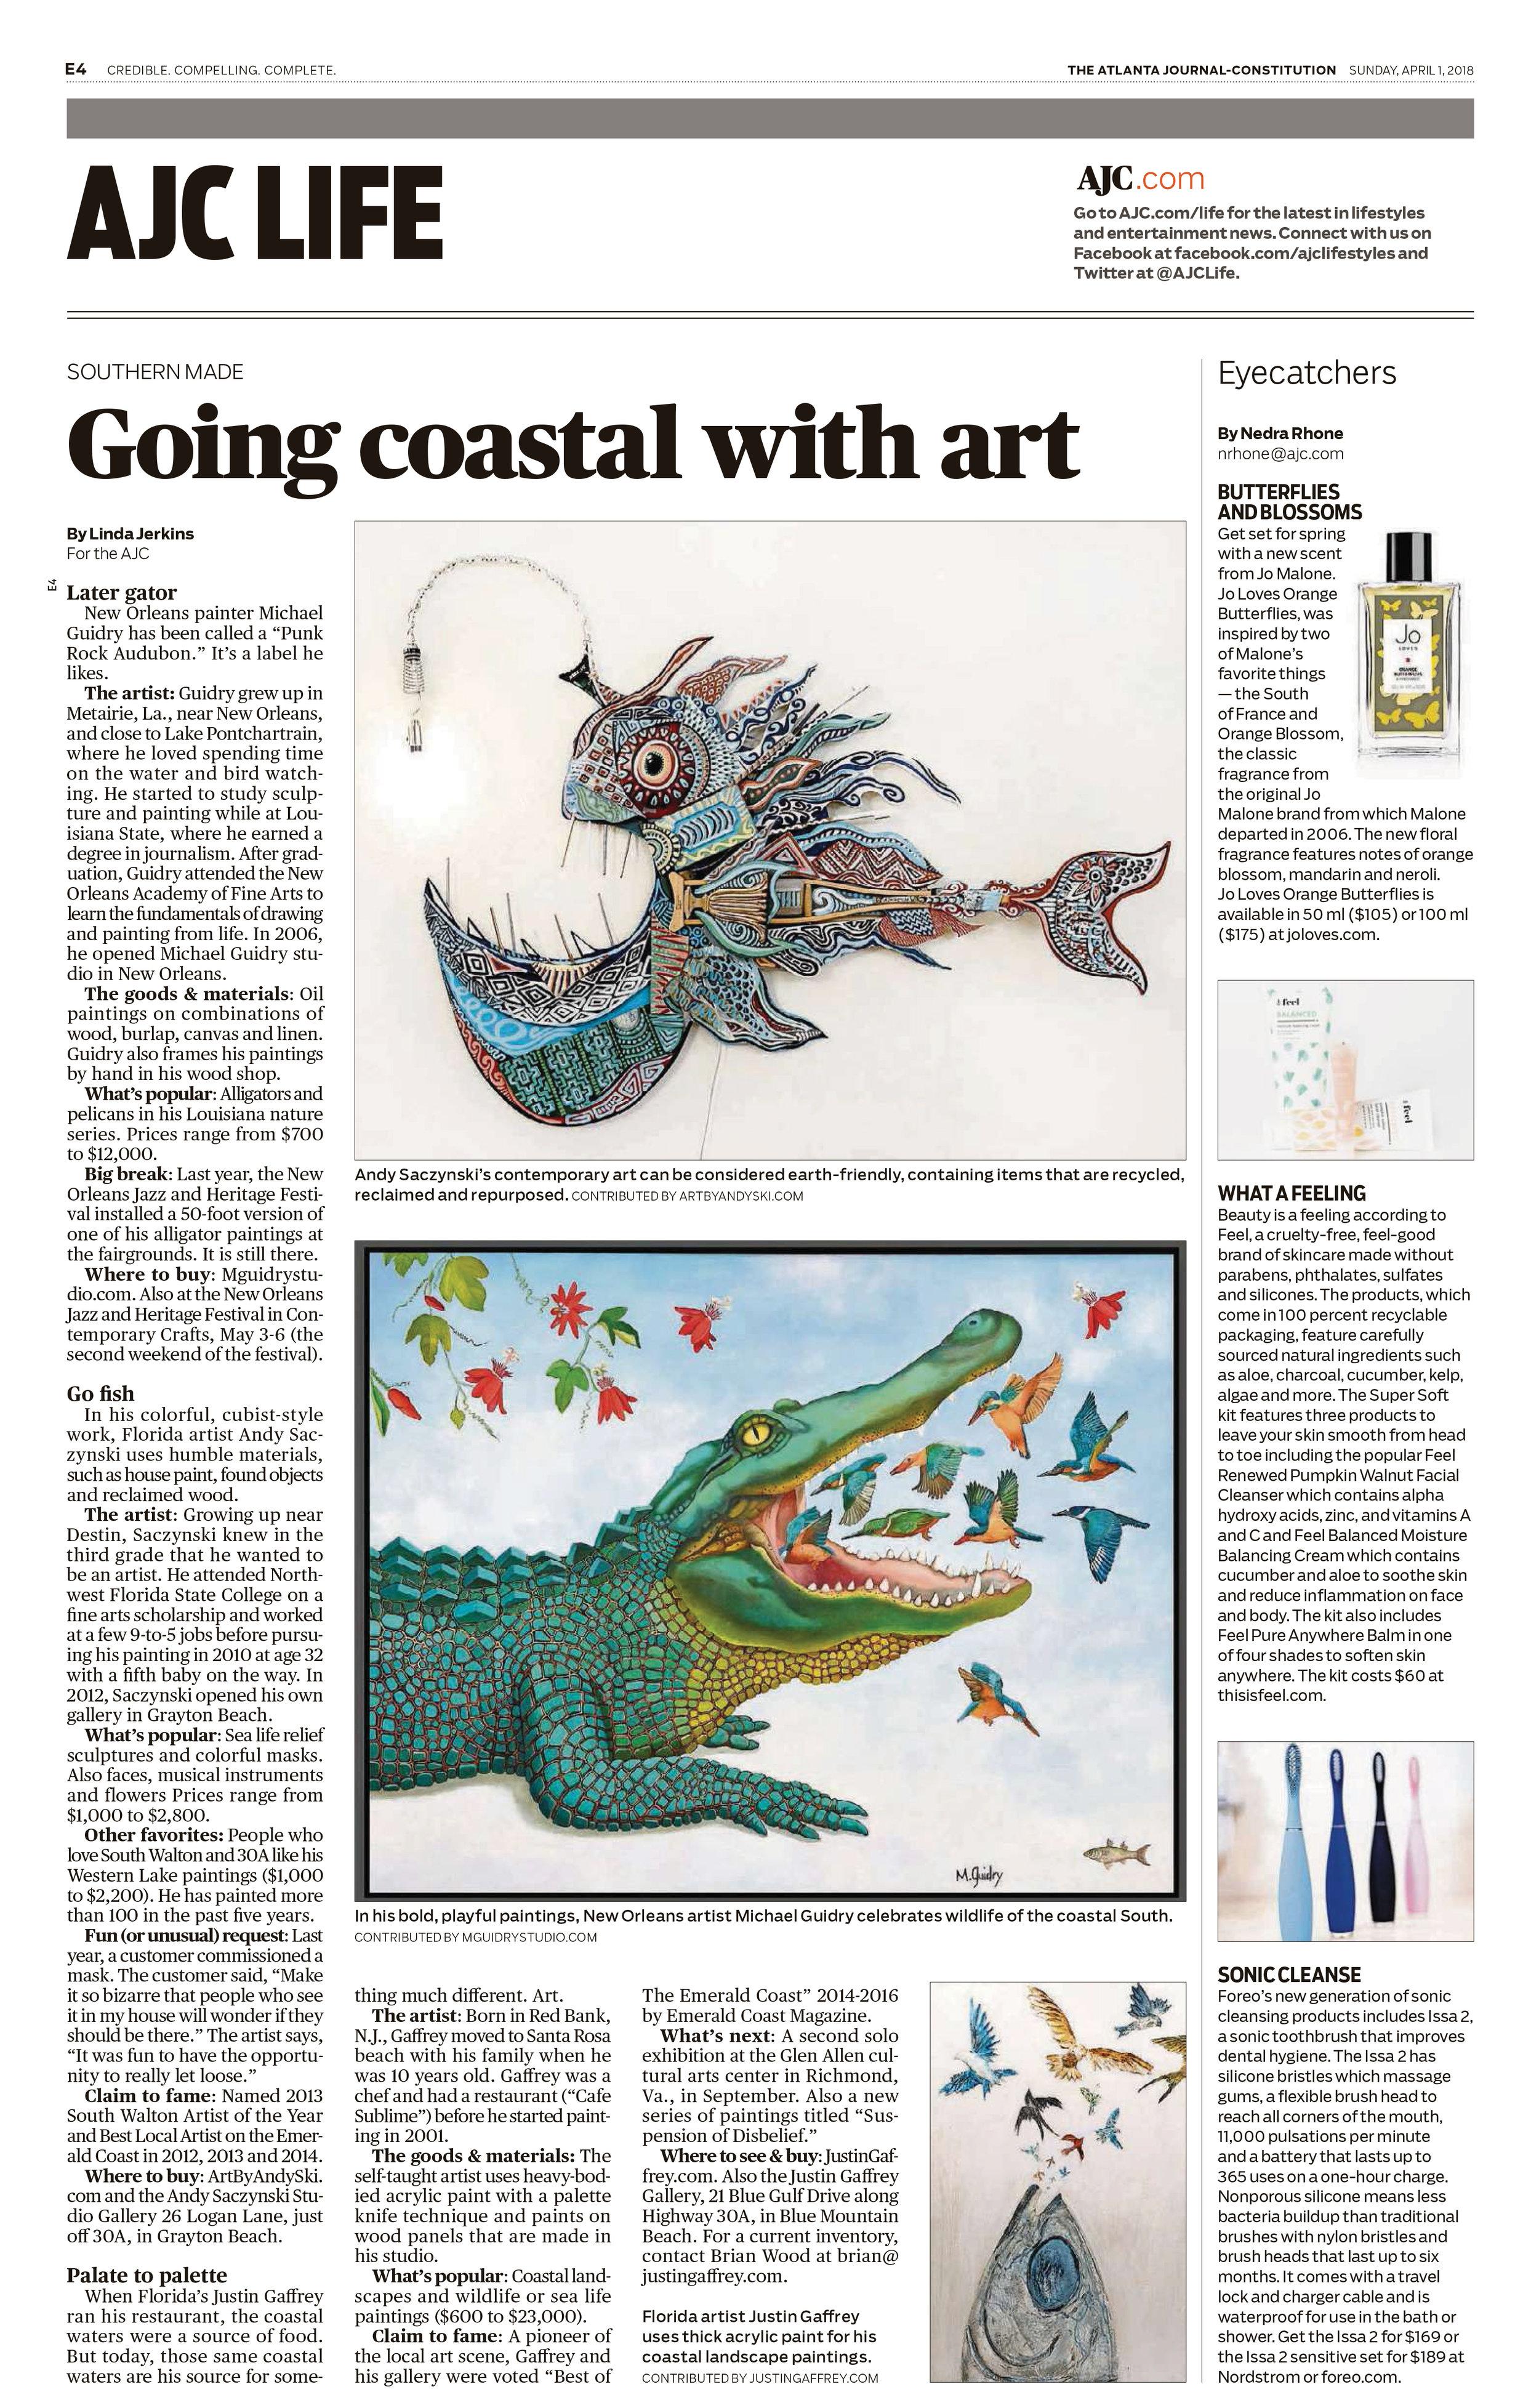 atlanta-journal-constitution-m-michael-guidry-neworleans-louisiana-artist-studio-painter-alligator-interview-article.jpg